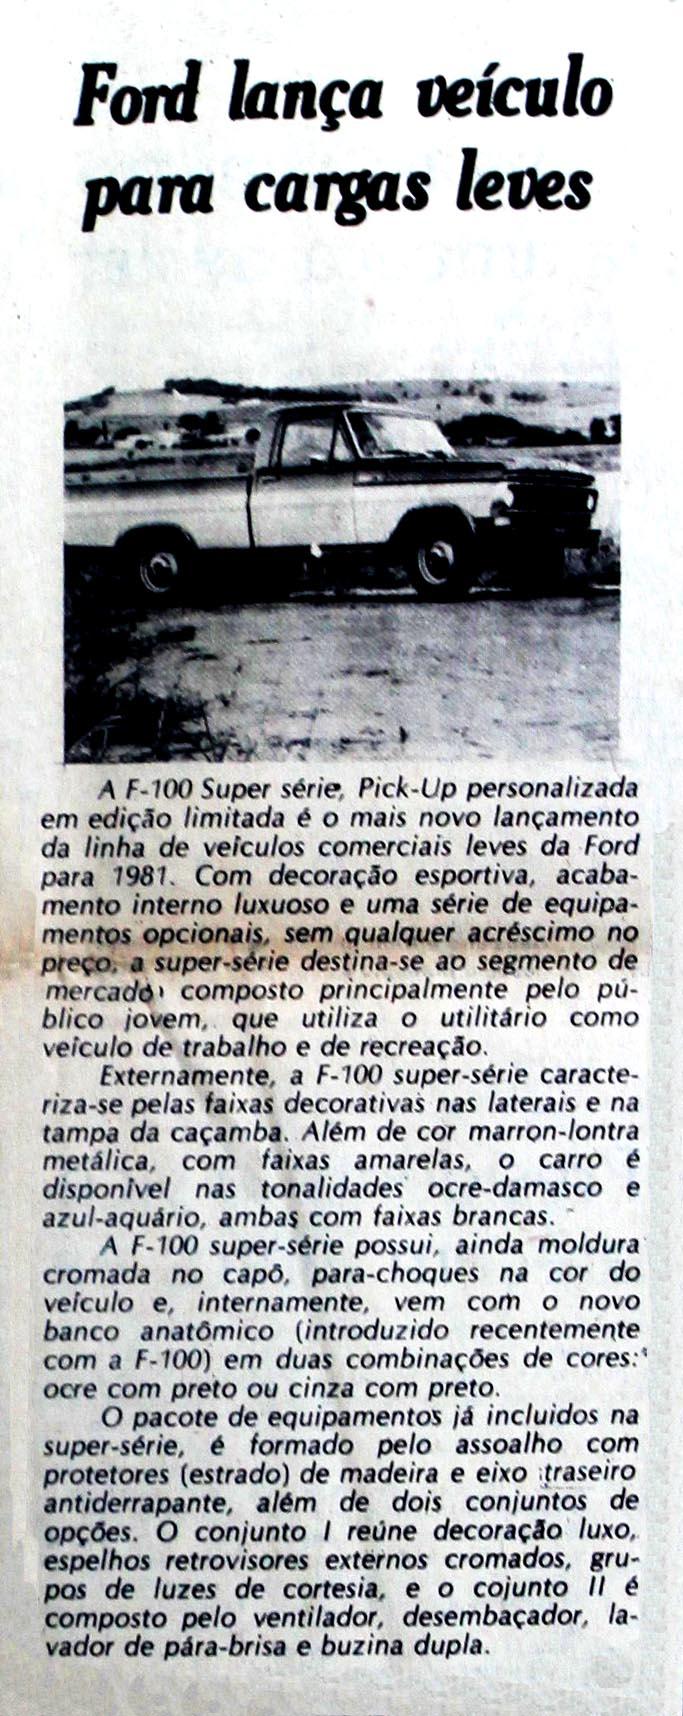 Ford lança Pick-Up F-100